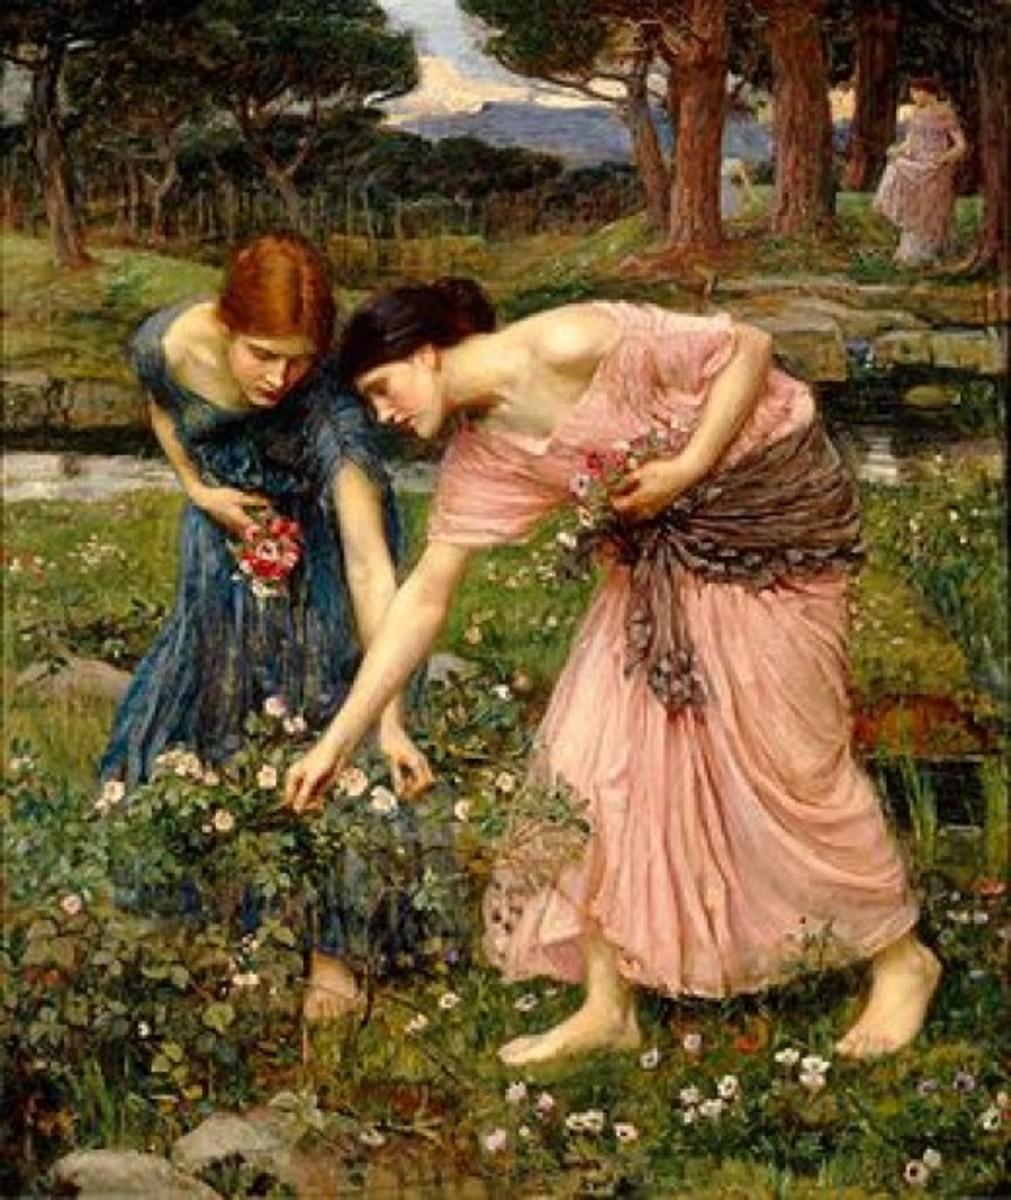 Gather Ye Rosebuds While Ye May by Waterhouse